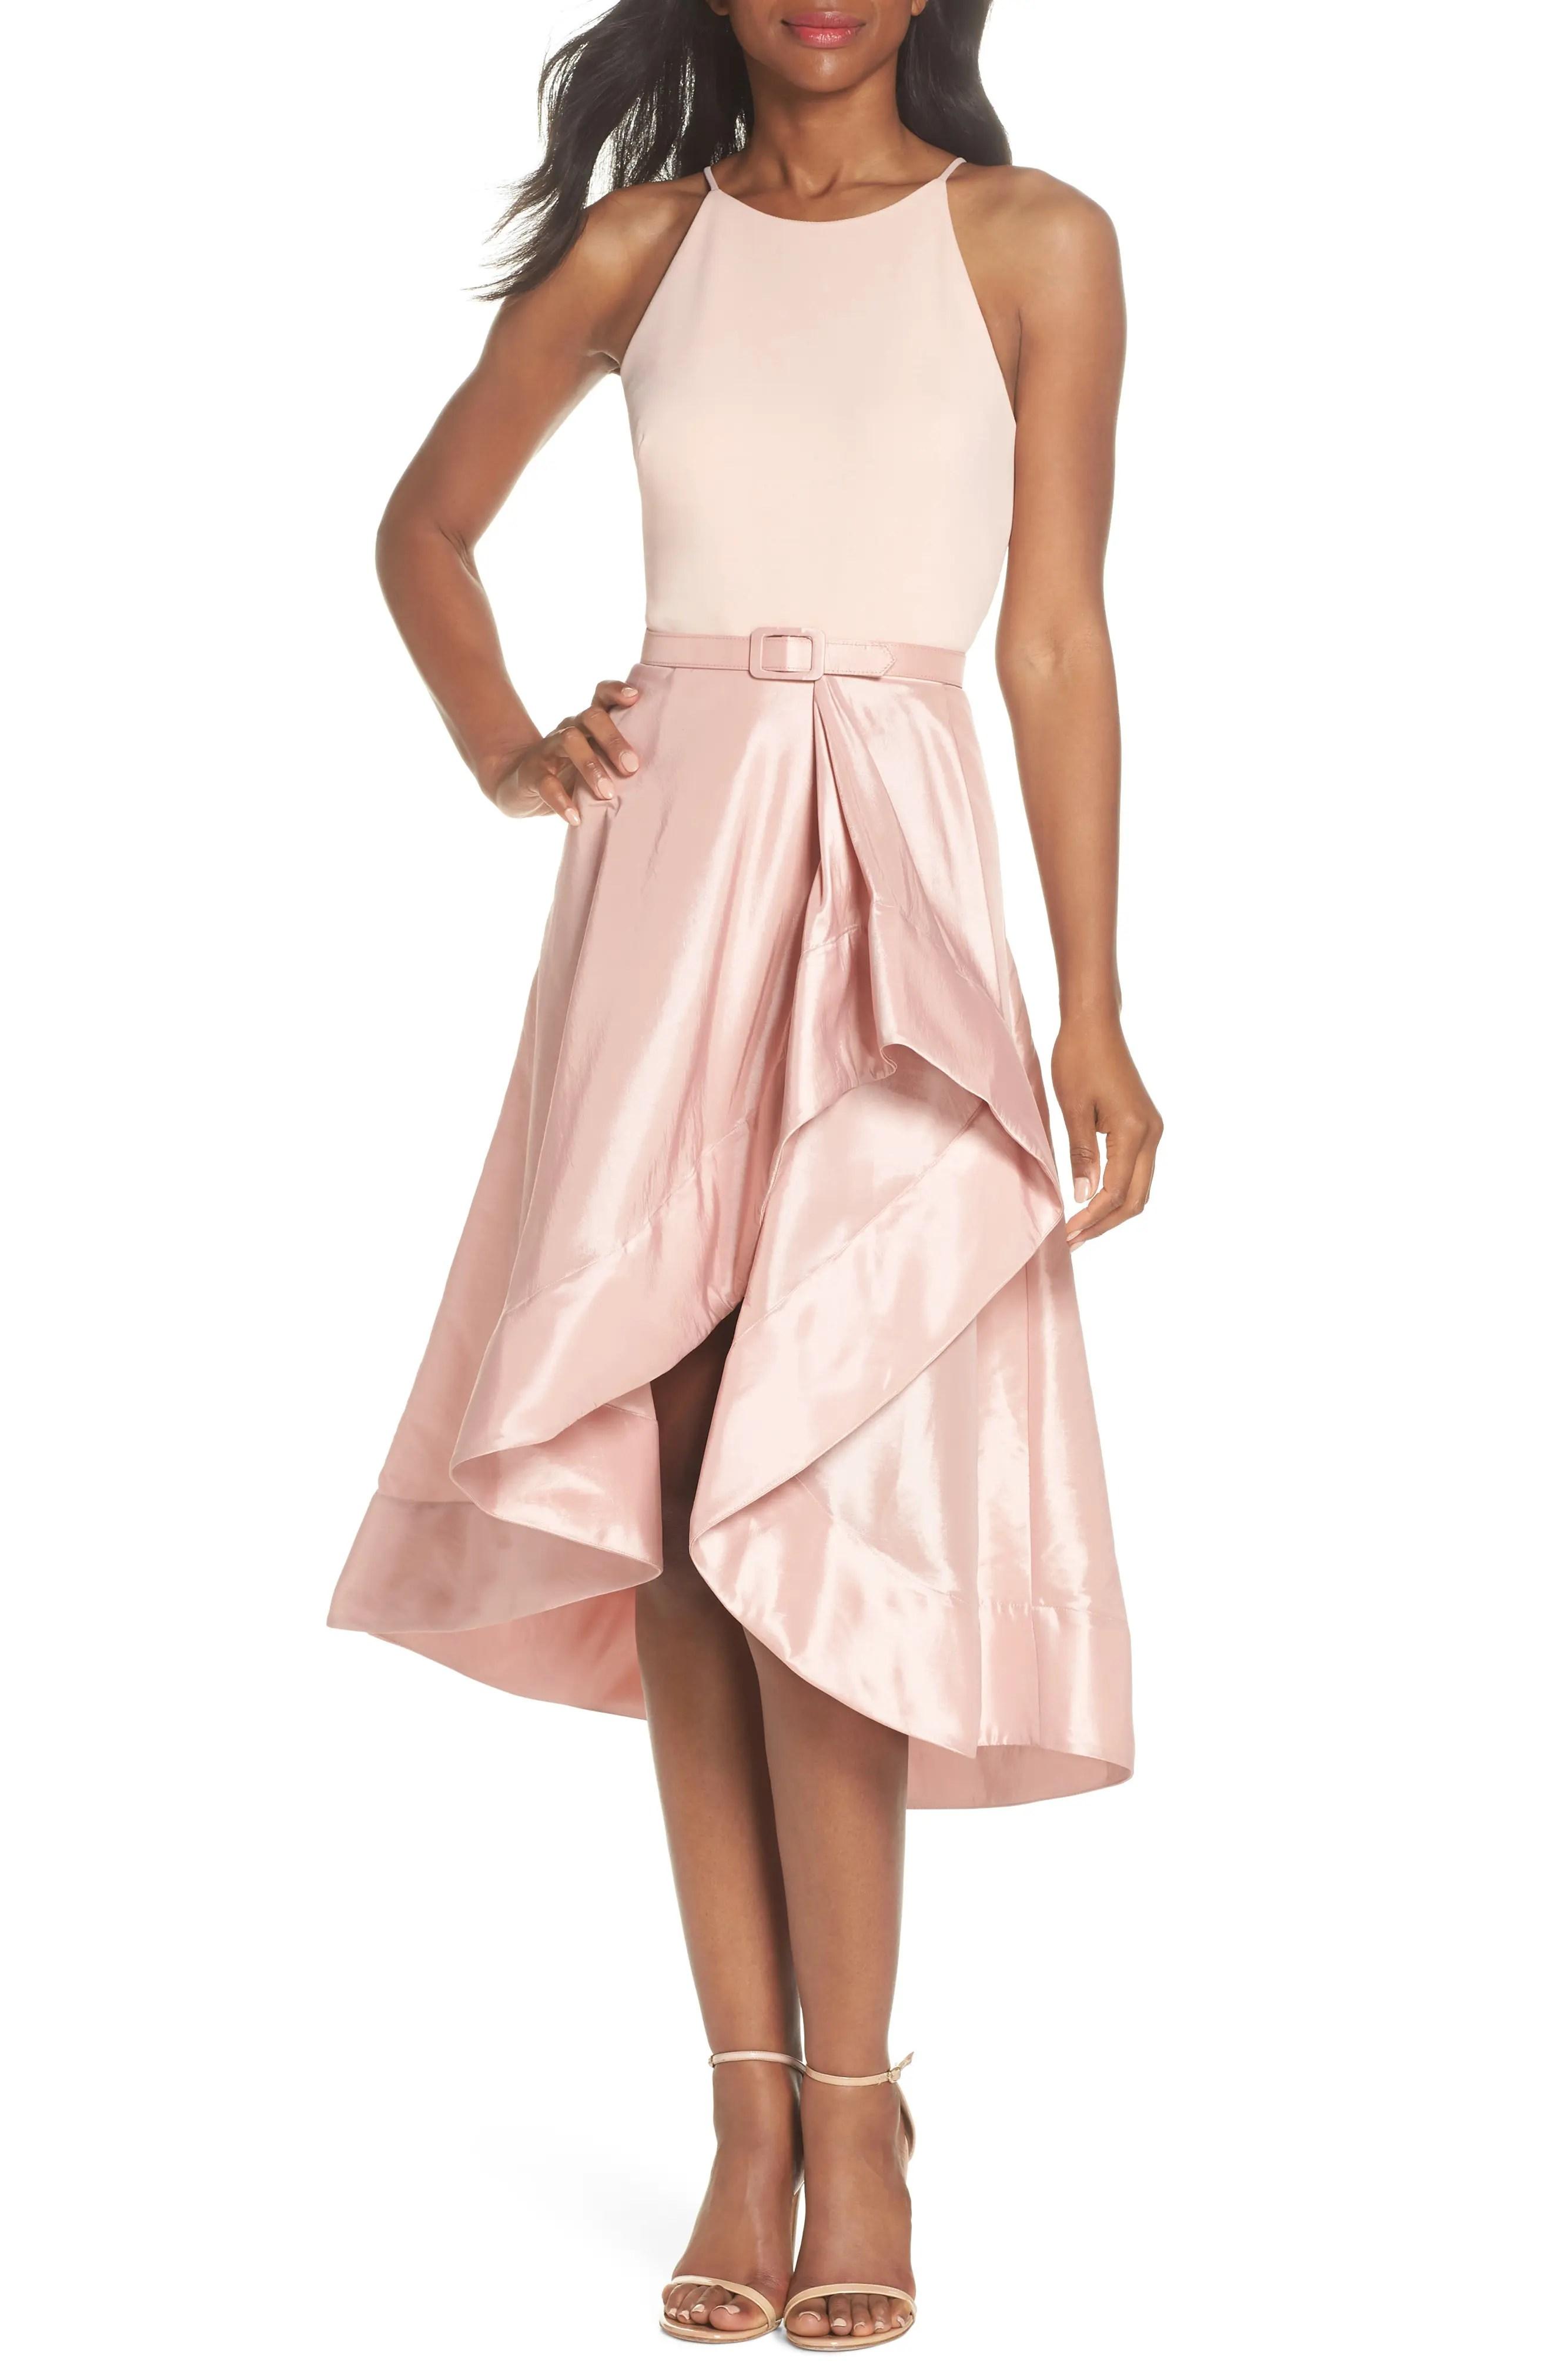 Eliza  asymmetrical tea length dress regular  petite also women  dresses nordstrom rh shoprdstrom